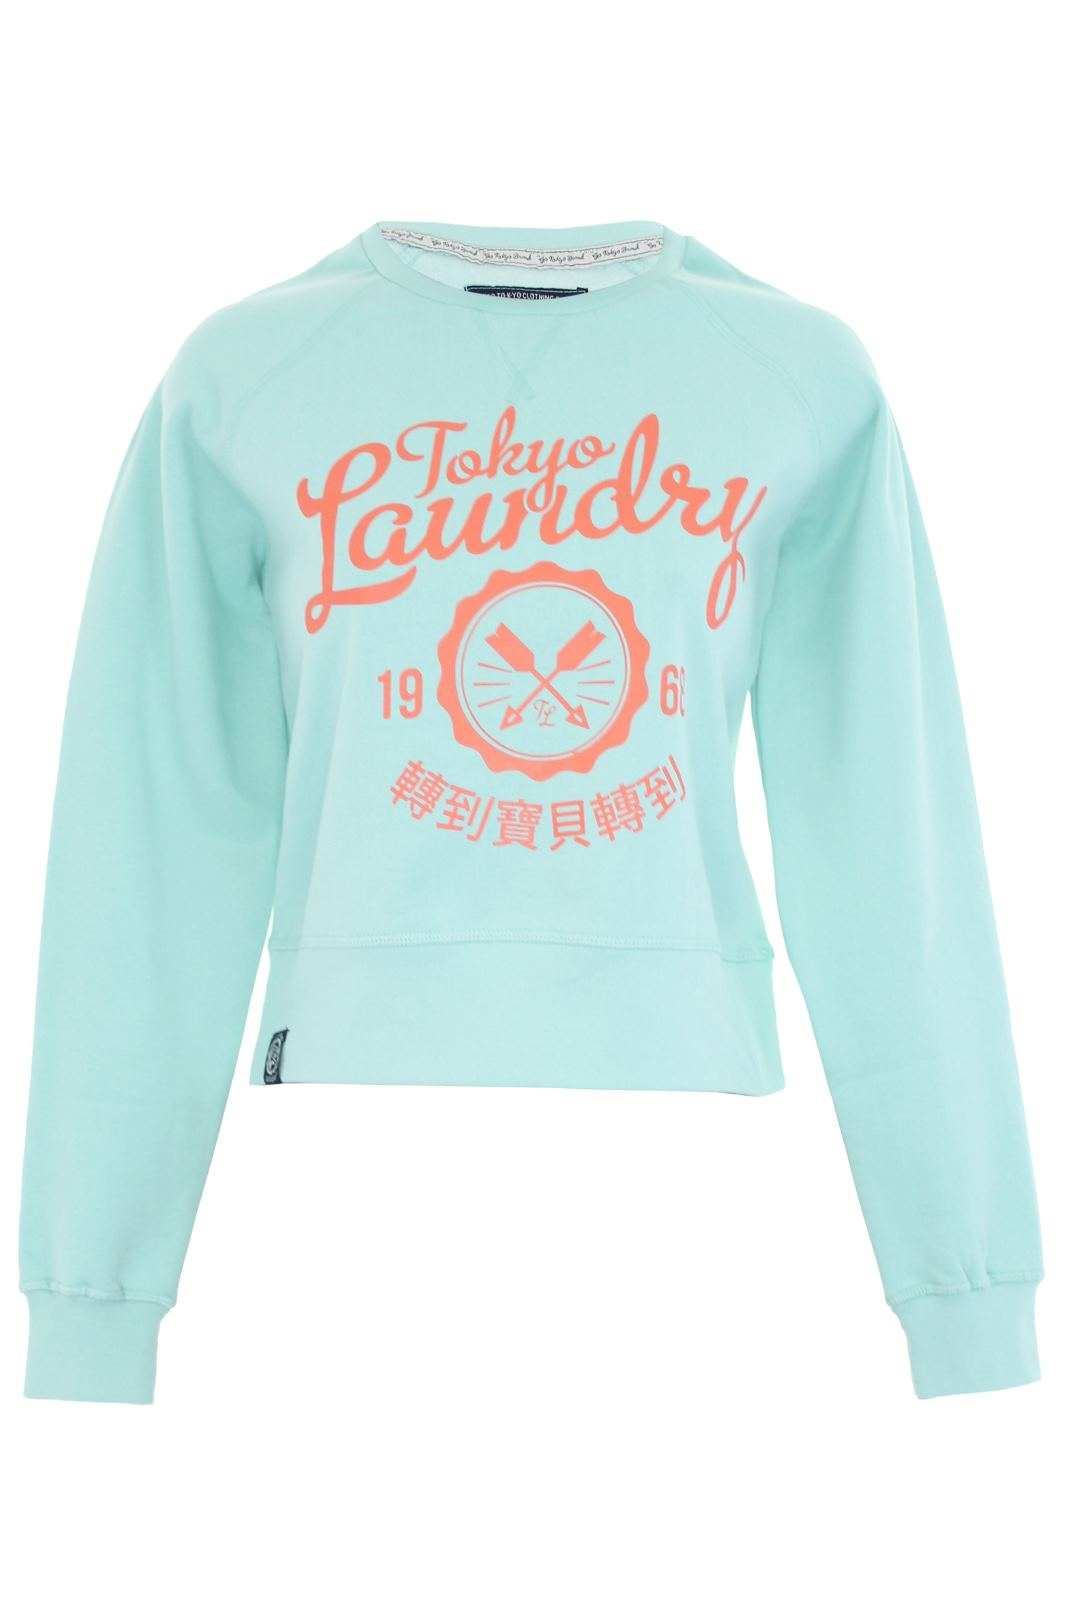 Womens/ Ladies Tokyo Laundry Sweater Jumper 'Emily' Plastisol Print Sweatshirt